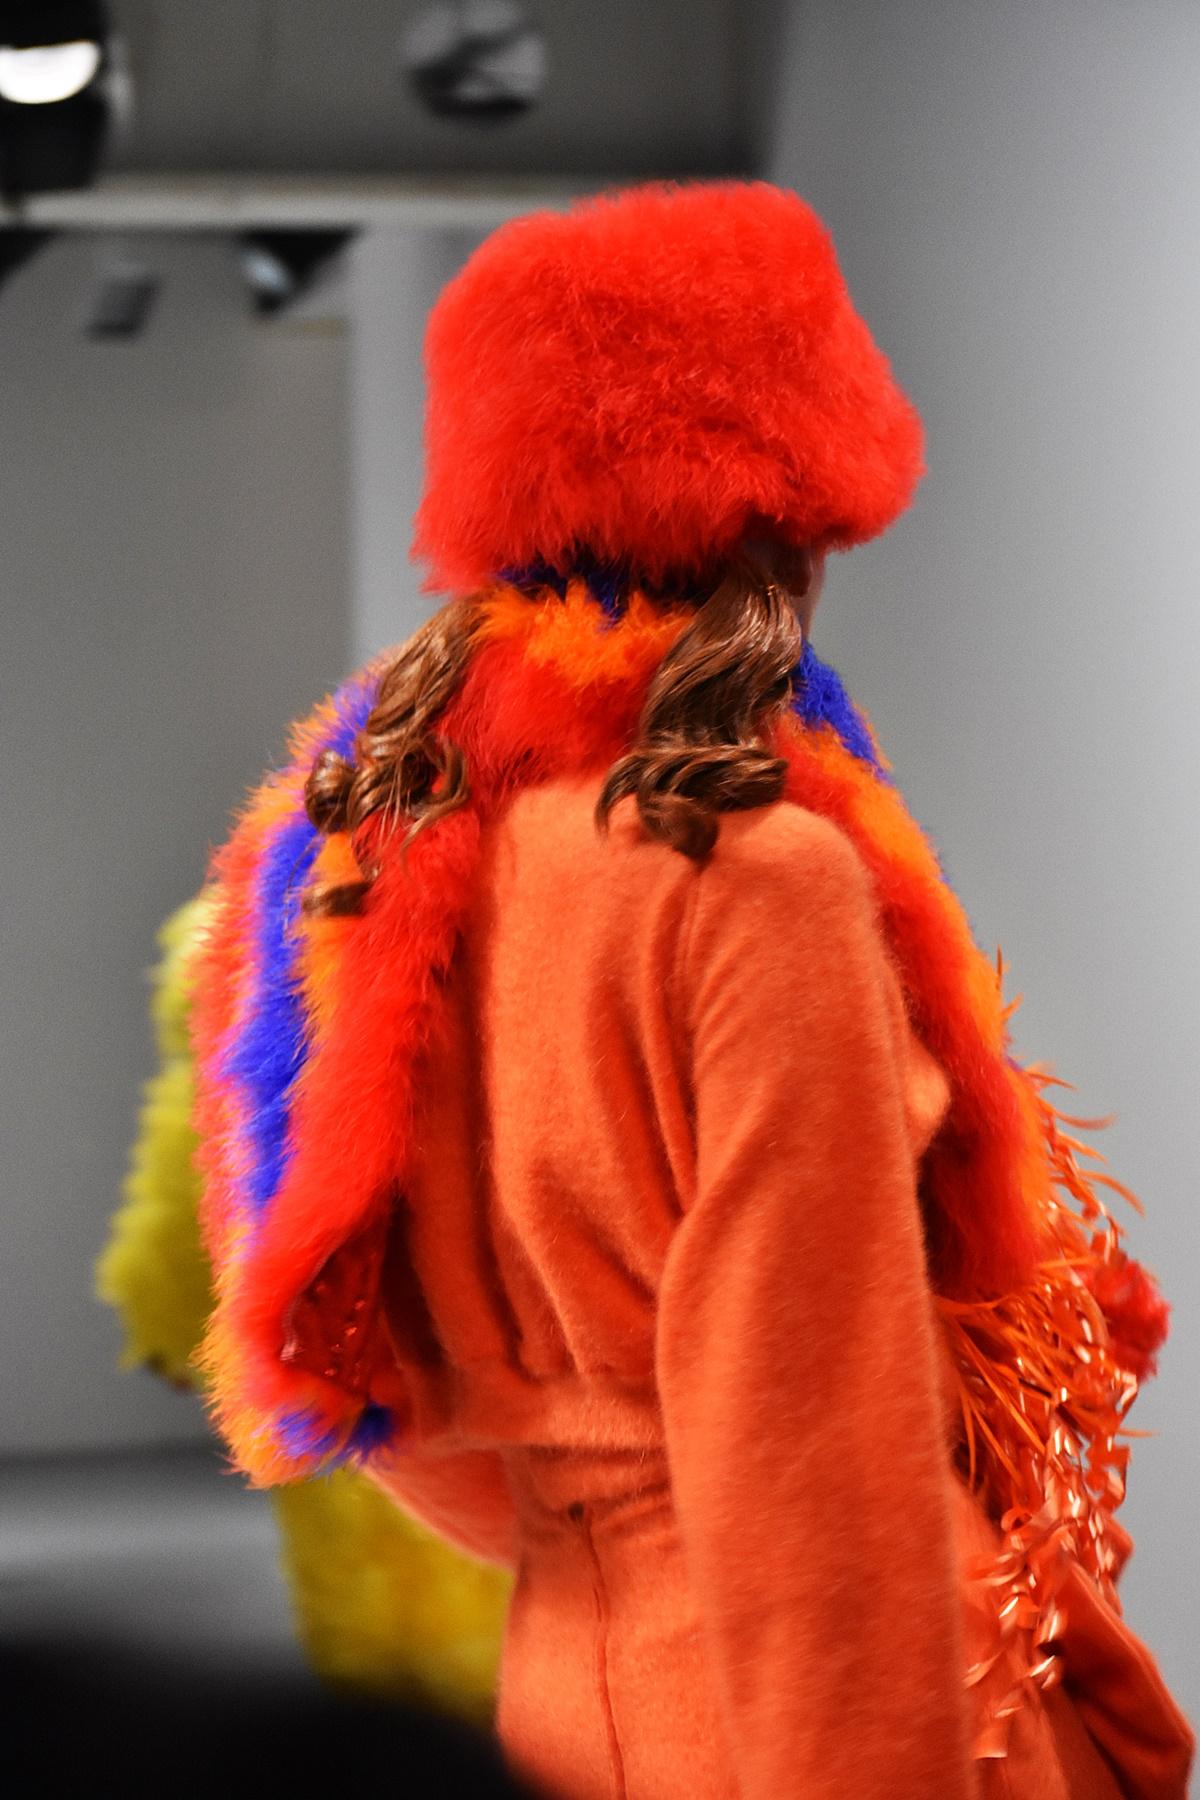 Jimmy Paul fashion show OnOff LFW Feb2019, Sesame street characters